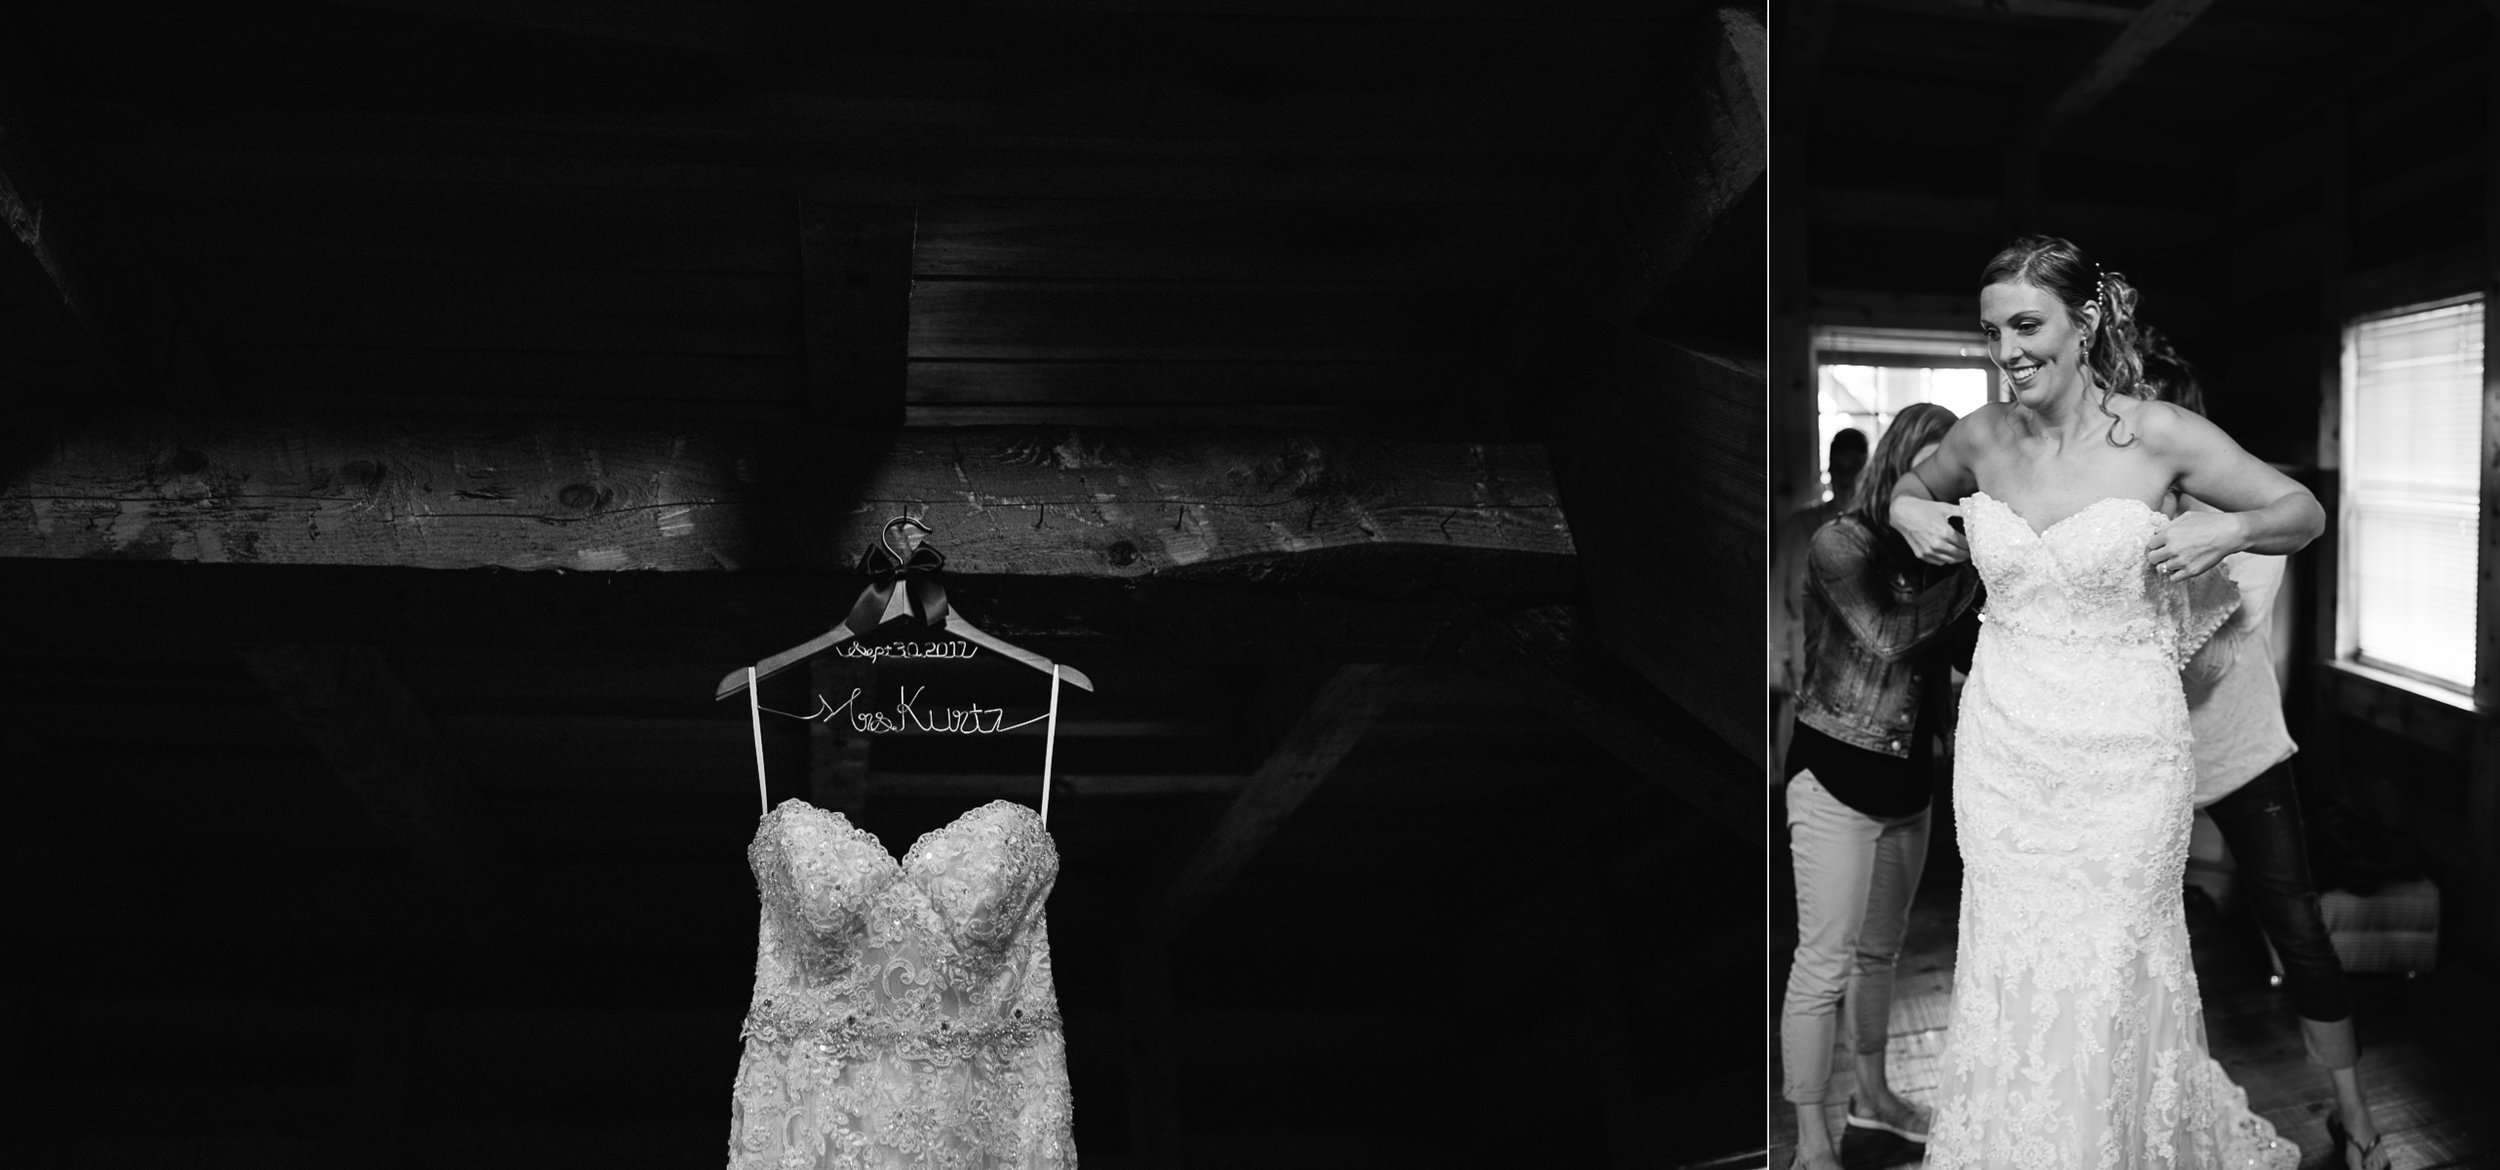 the-event-barn-at-highland-farms-somerset-pa-wedding-photographer.jpg